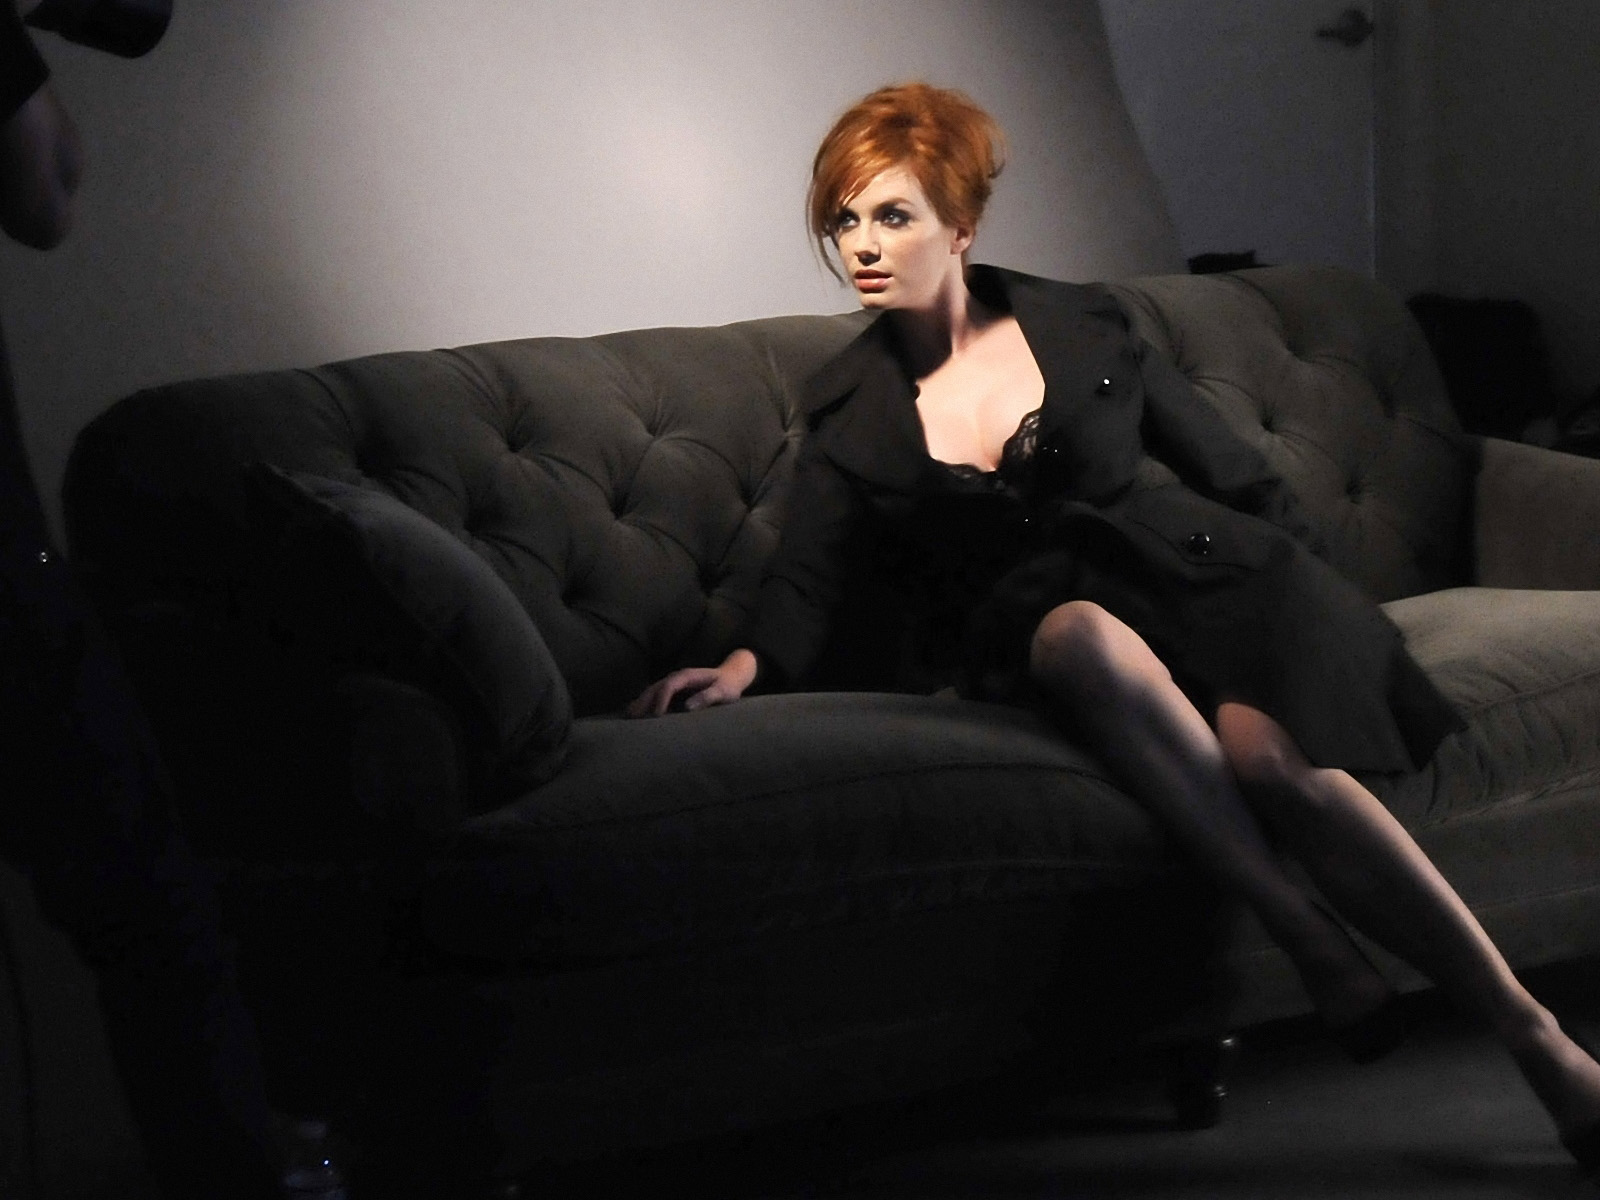 christina-hendricks-legs